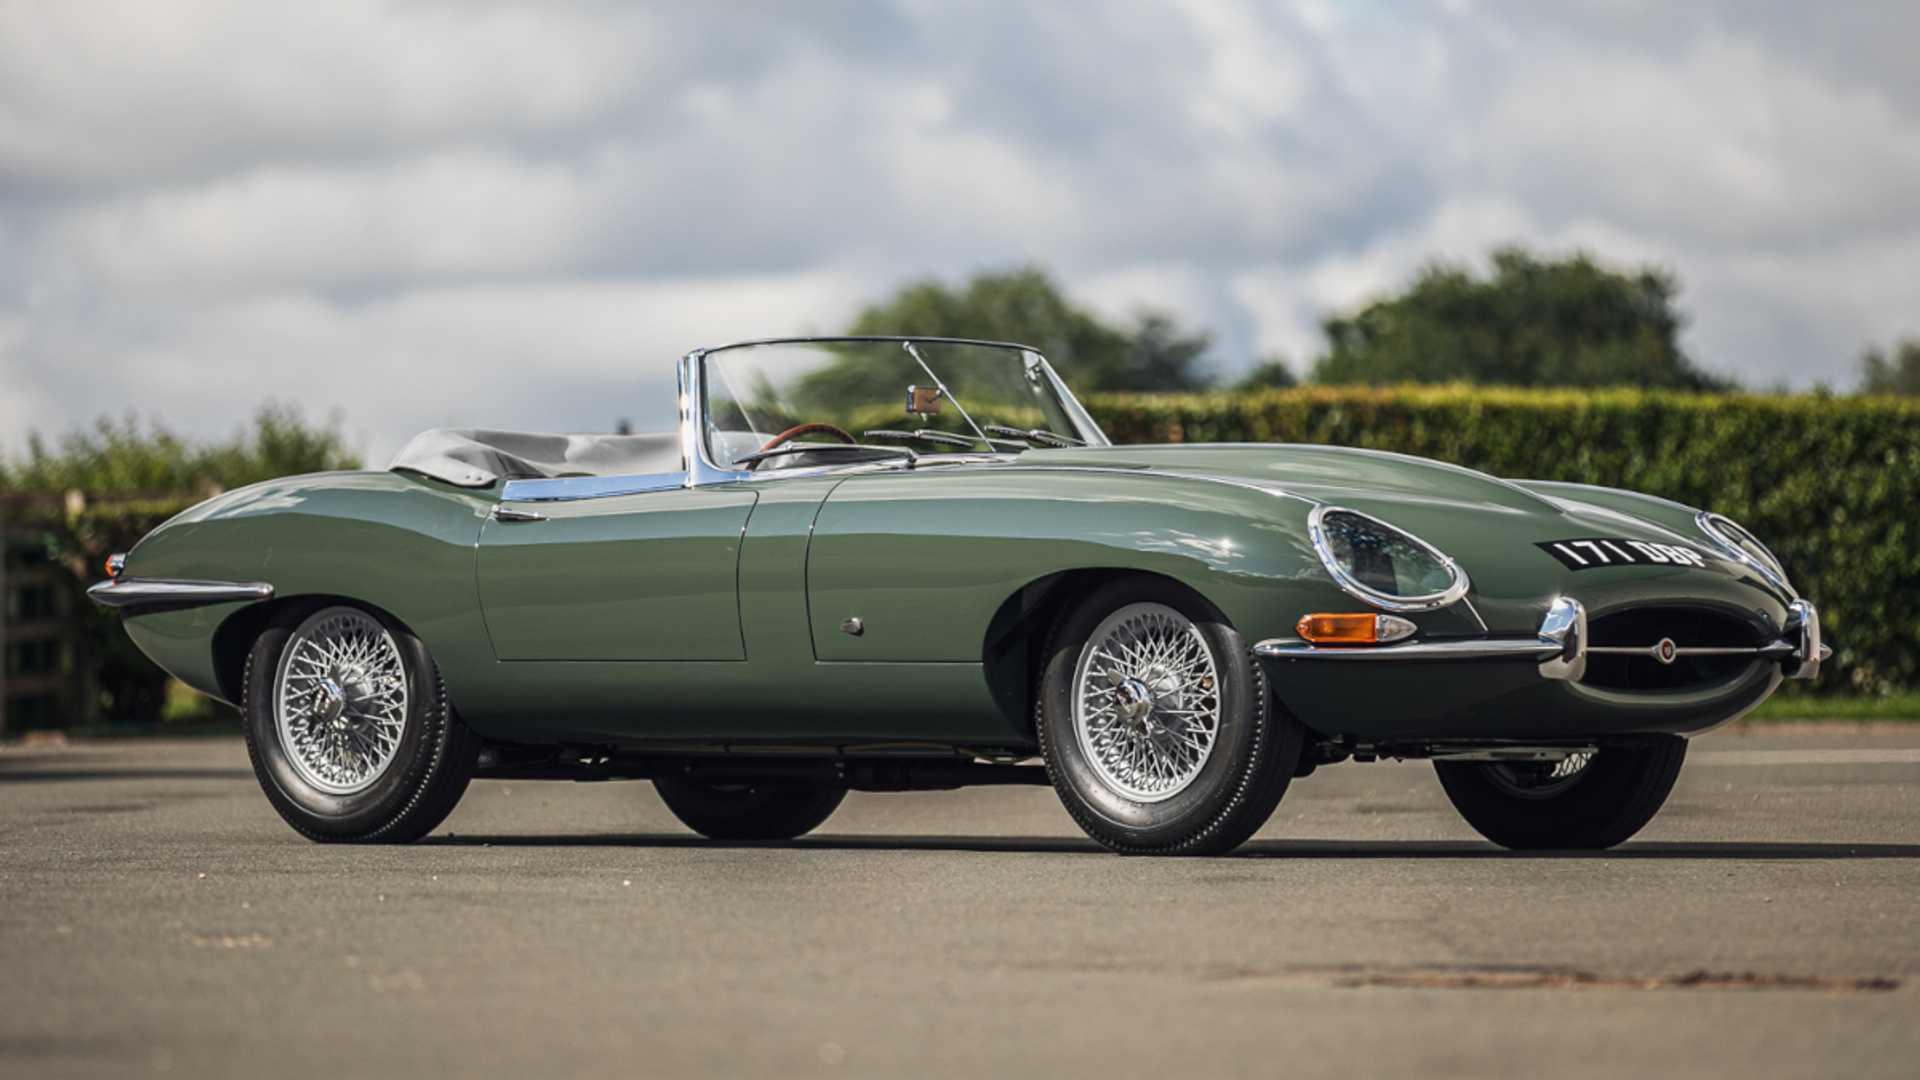 Este impecable Jaguar E-Type descapotable ahora puede ser tuyo